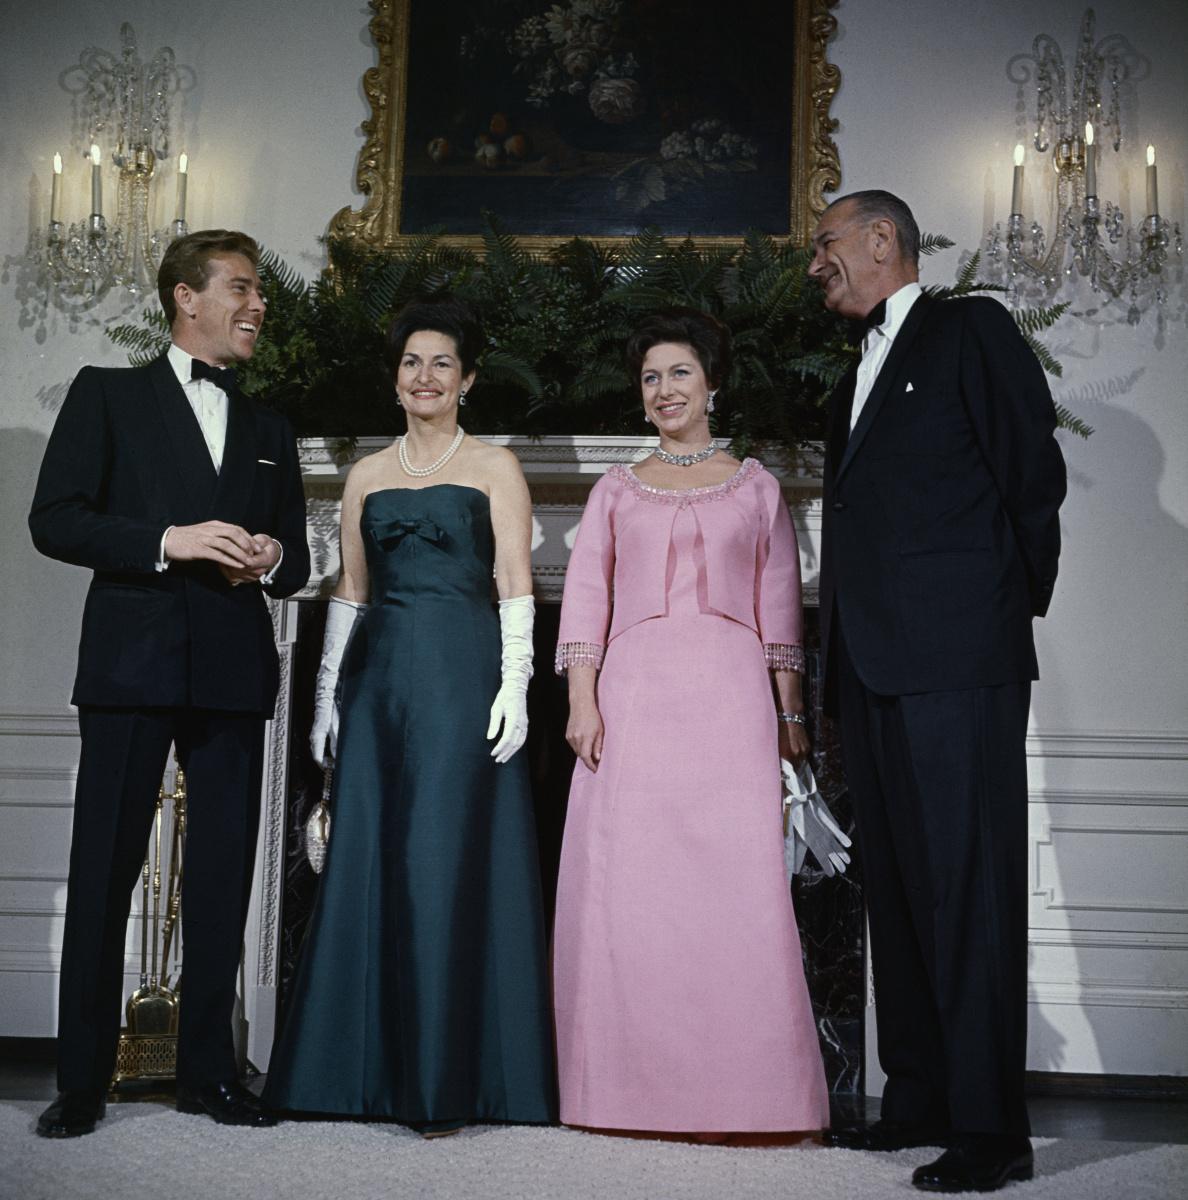 Princess Margaret Lord Snowon Lyndon Johnson Lady Bird Johnson